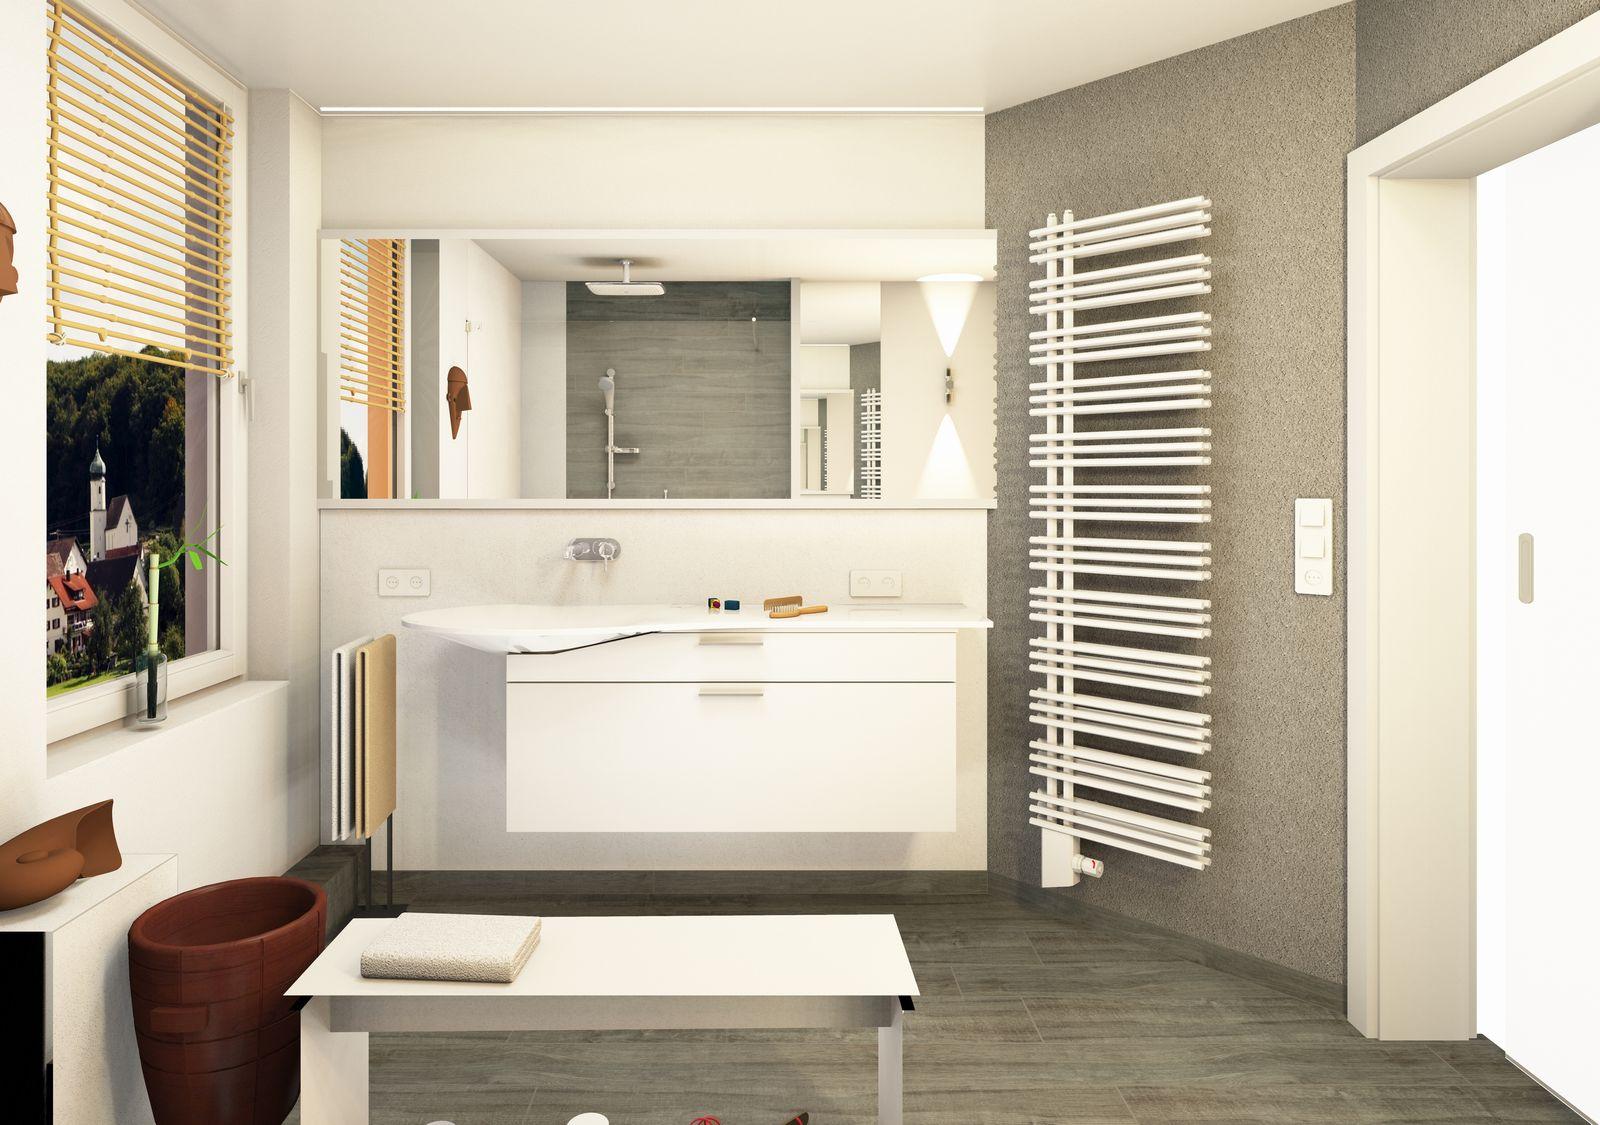 Badezimmer umbau planen 28 images barrierefreies badezimmer planen tipps zum umbau - Badezimmer umbau ideen ...